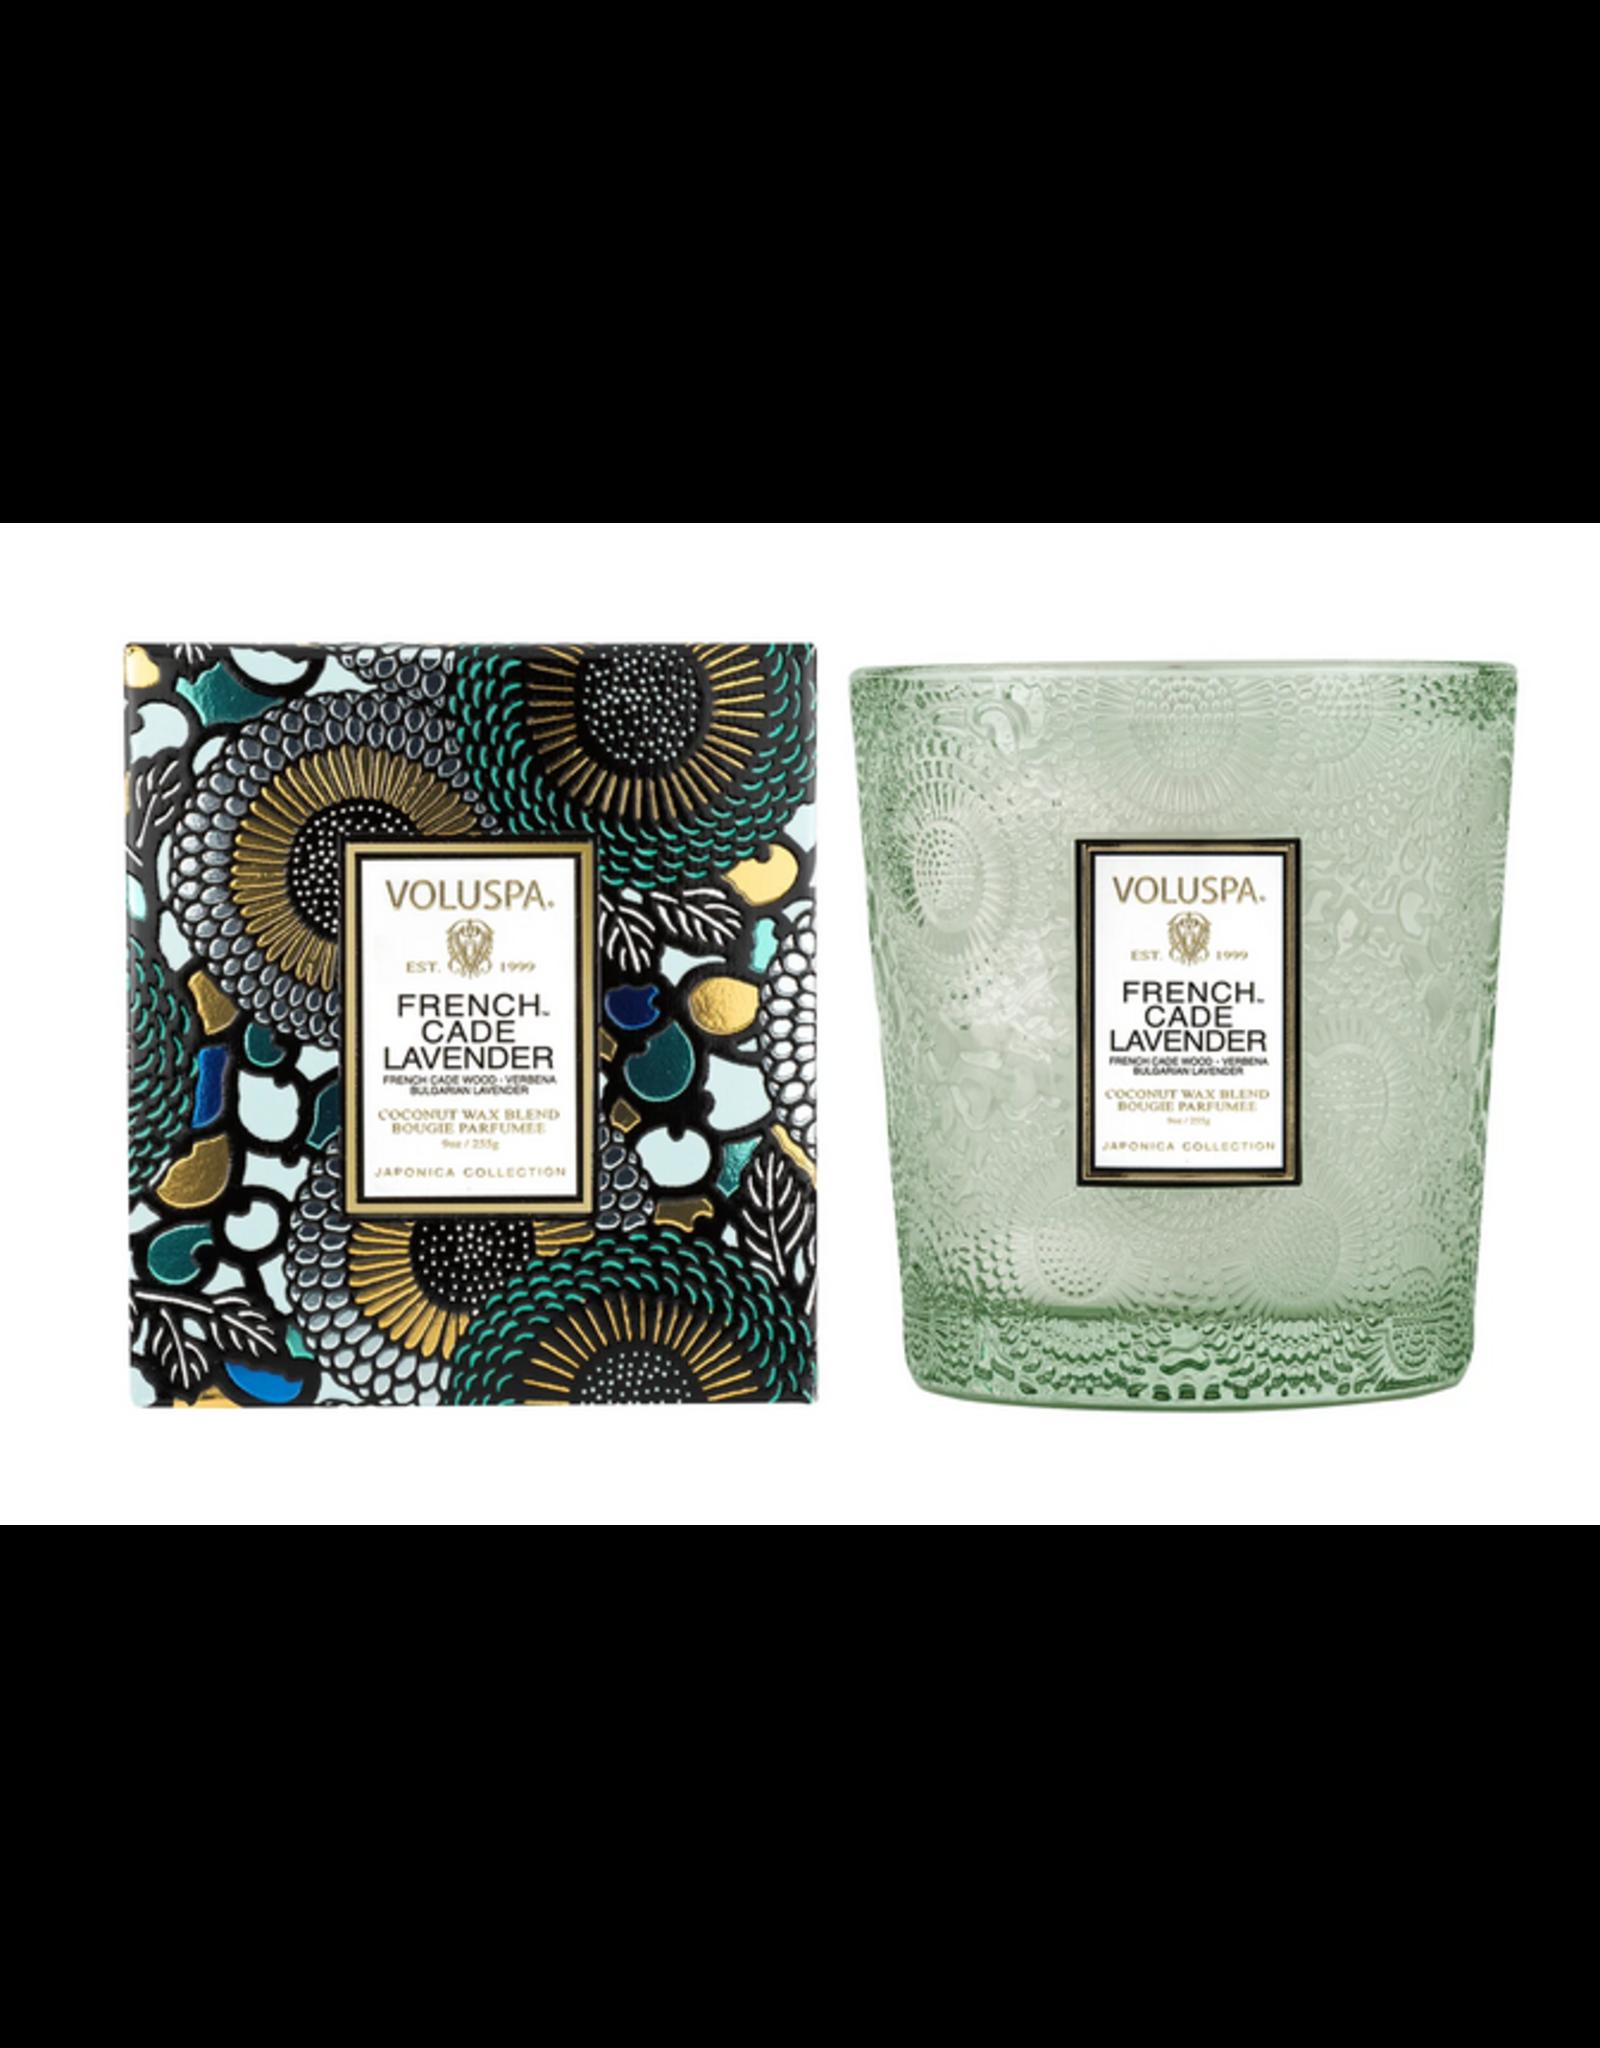 Voluspa French Cade & Lavender Classic Candle